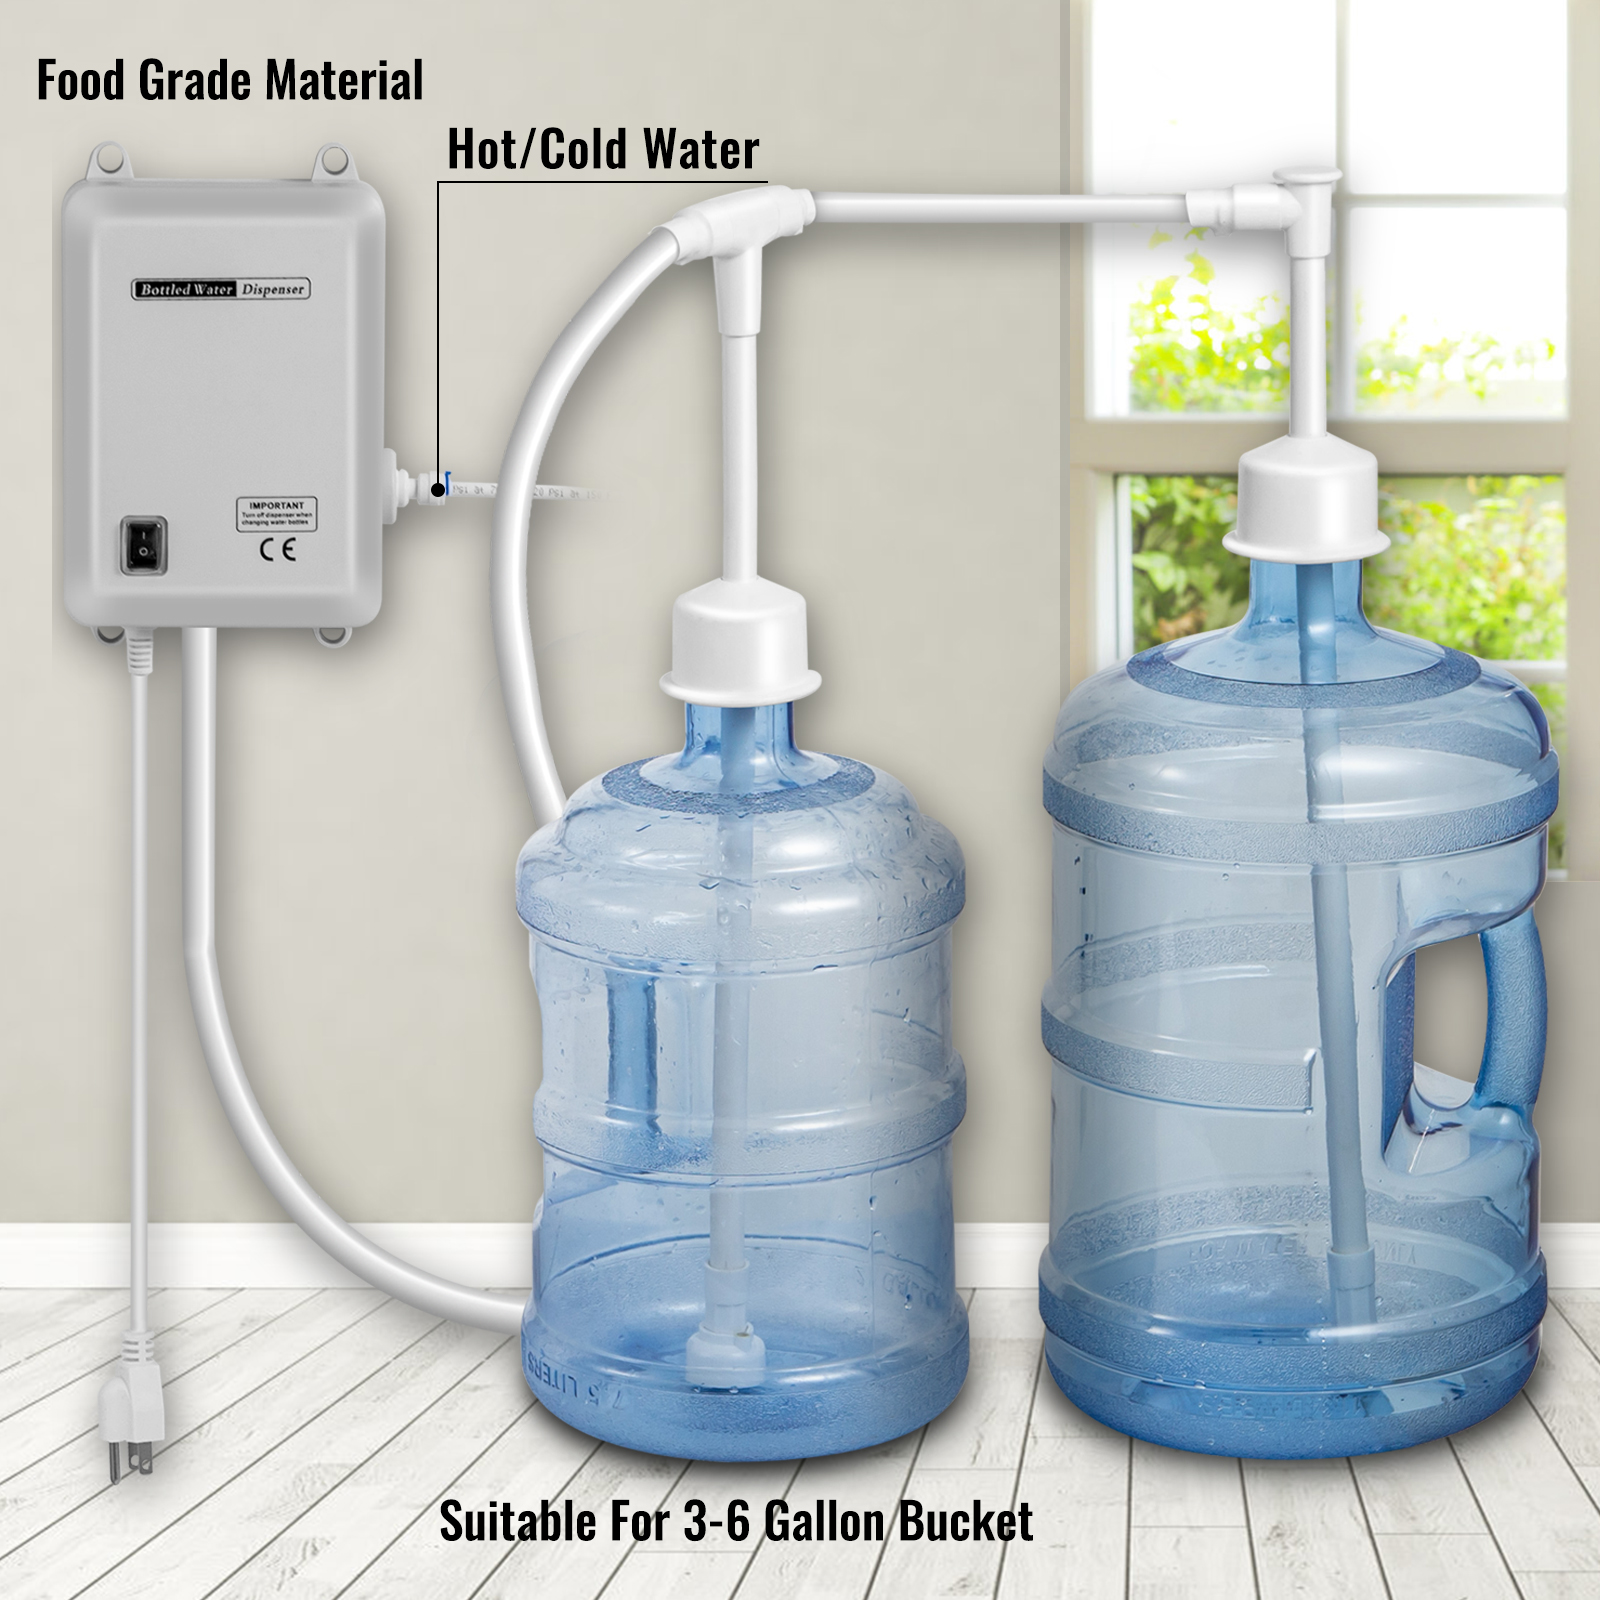 120V AC Bottled Water Dispensing Pump System Dispenser Replace Bunn Flojet 40PSI